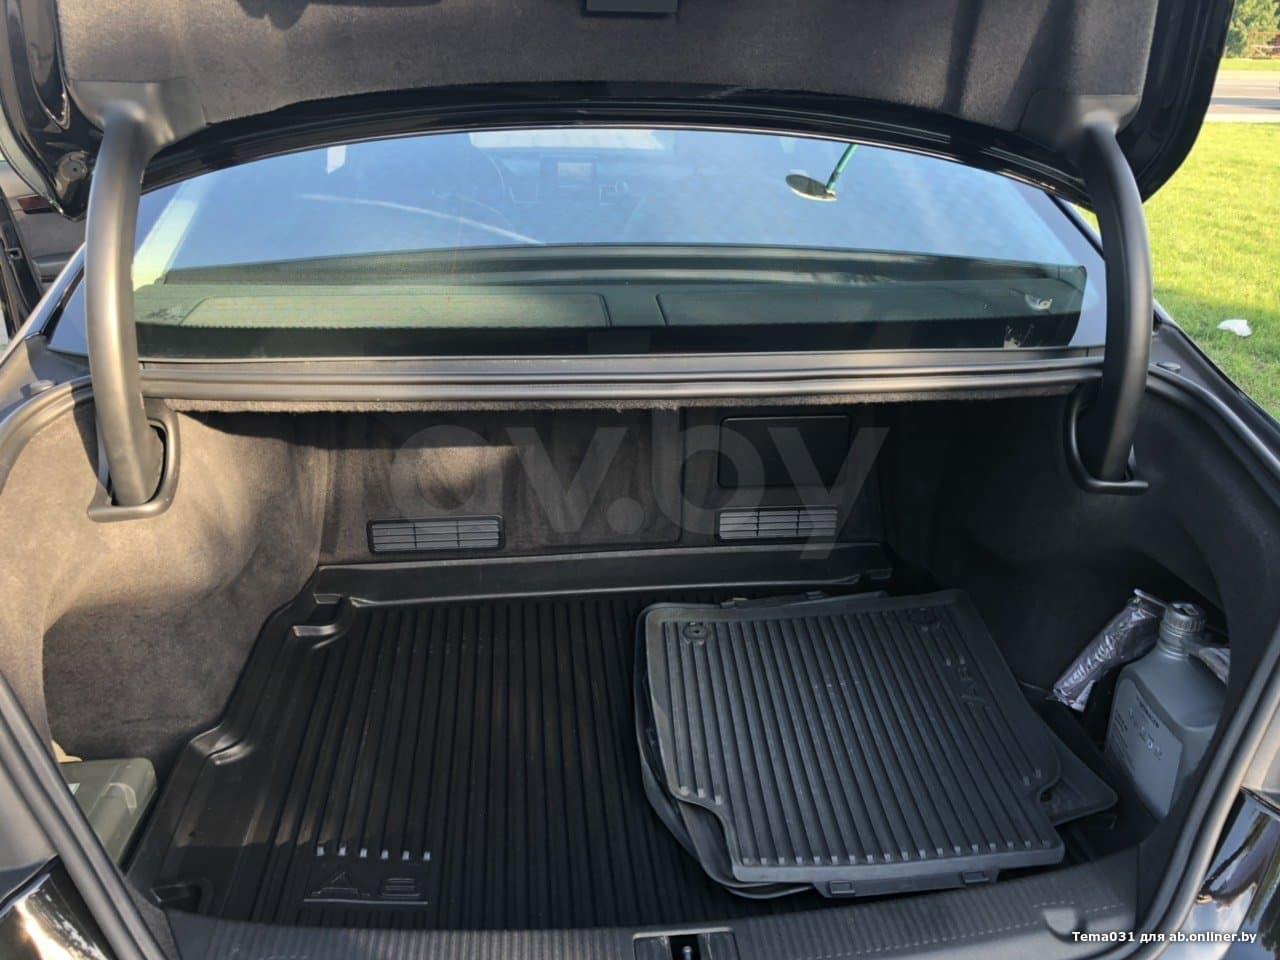 Audi A8 D4 long